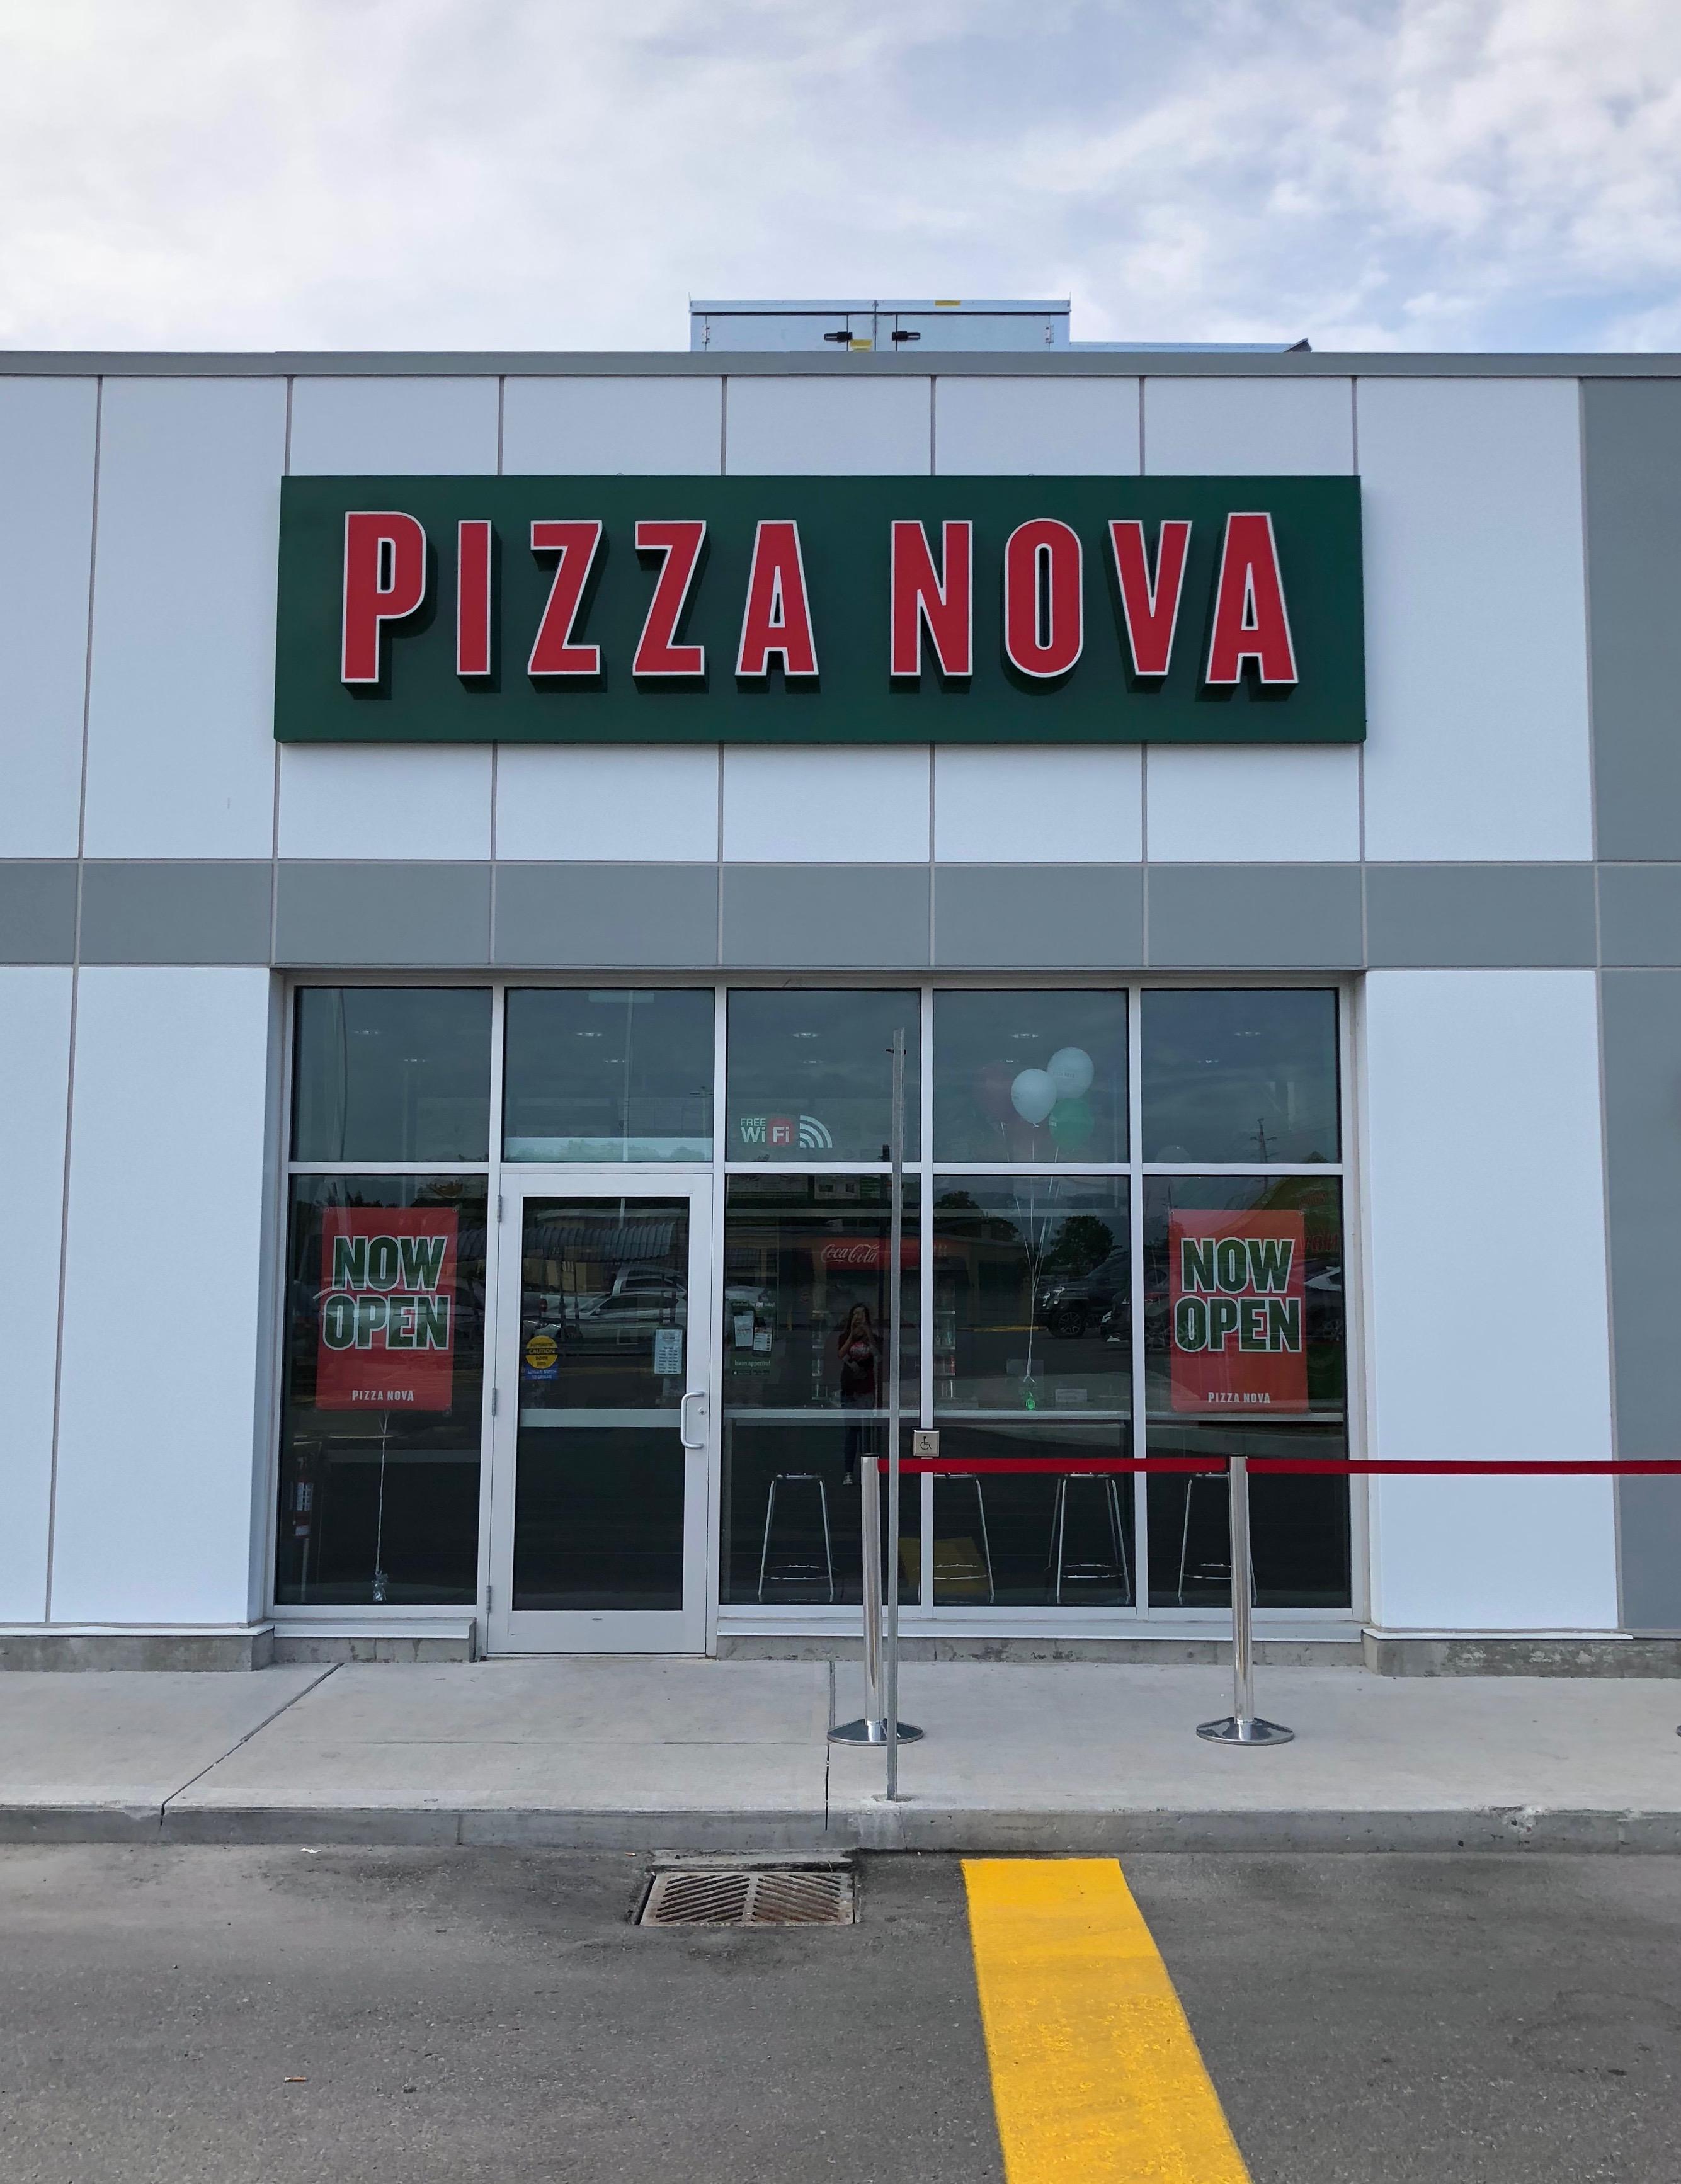 pizza nova orillia 293 coldwater rd w pizza nova. Black Bedroom Furniture Sets. Home Design Ideas